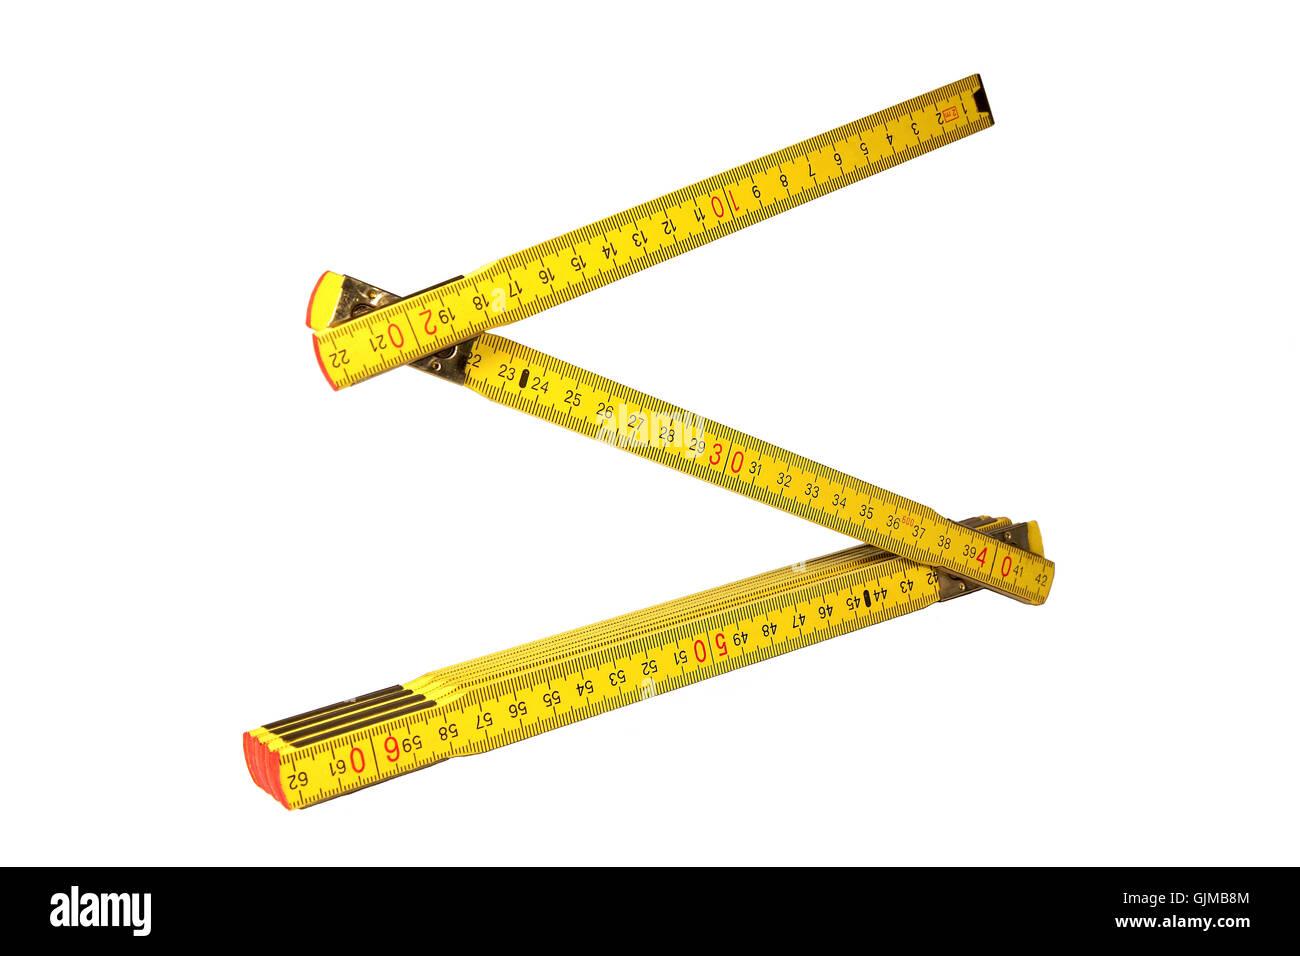 yardstick tool wood - Stock Image